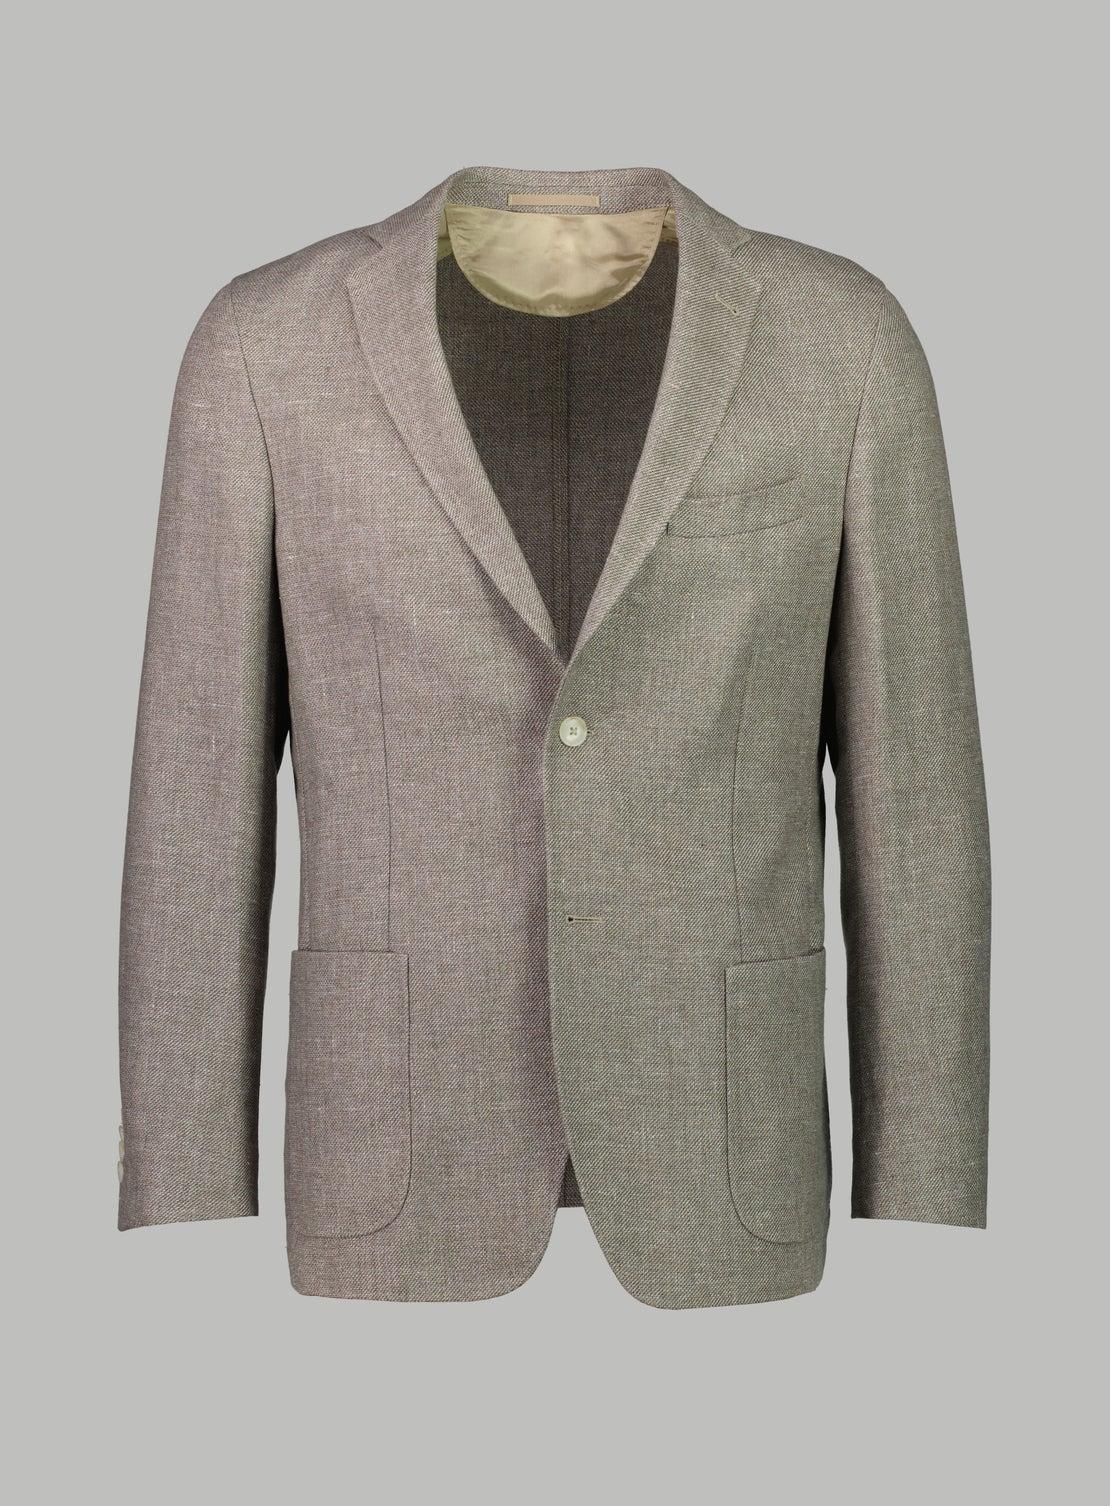 Porto Brown Twill Jacket